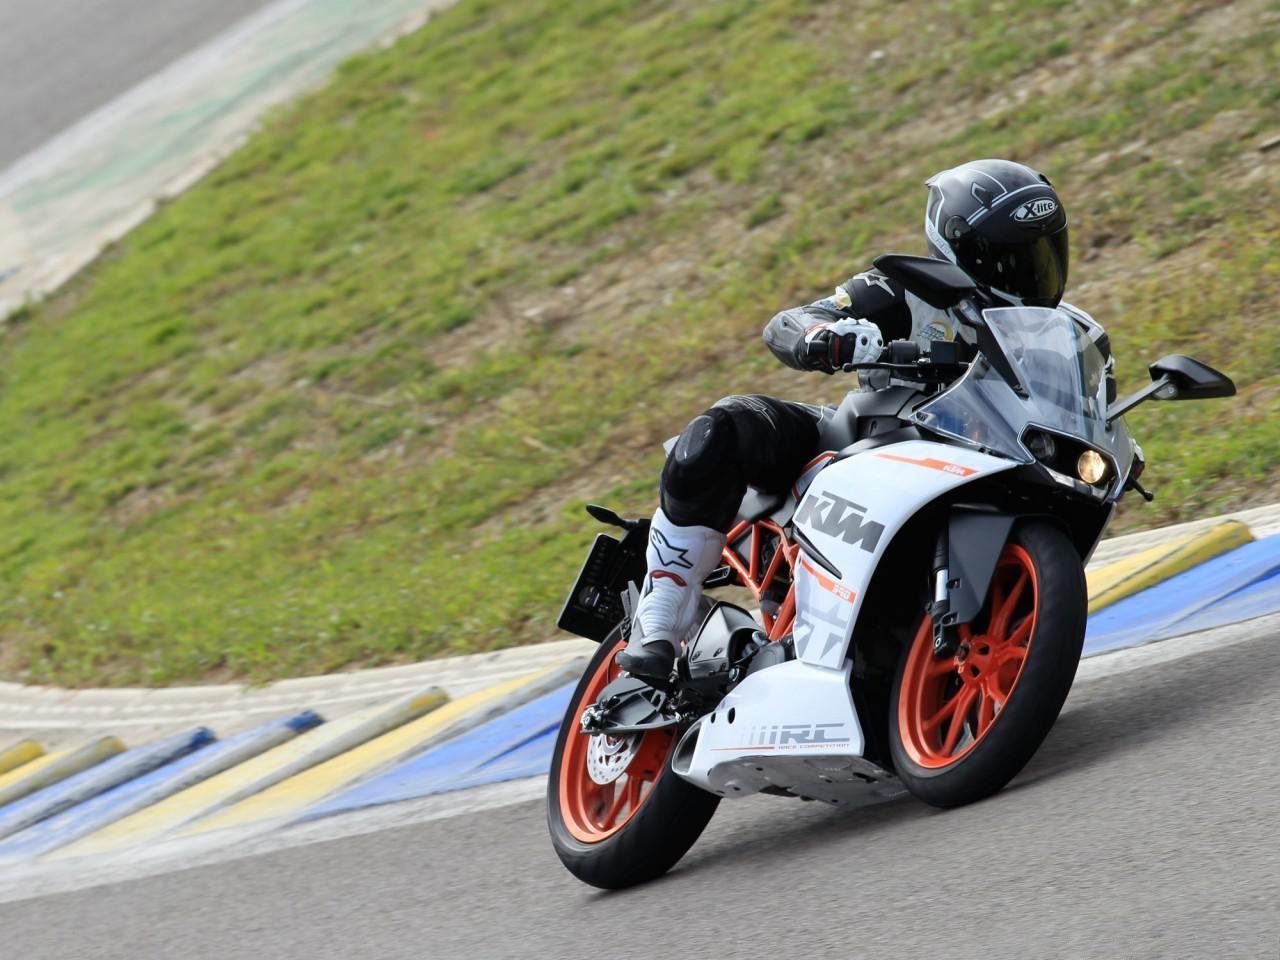 KTM RC 390 Test for Moto 3